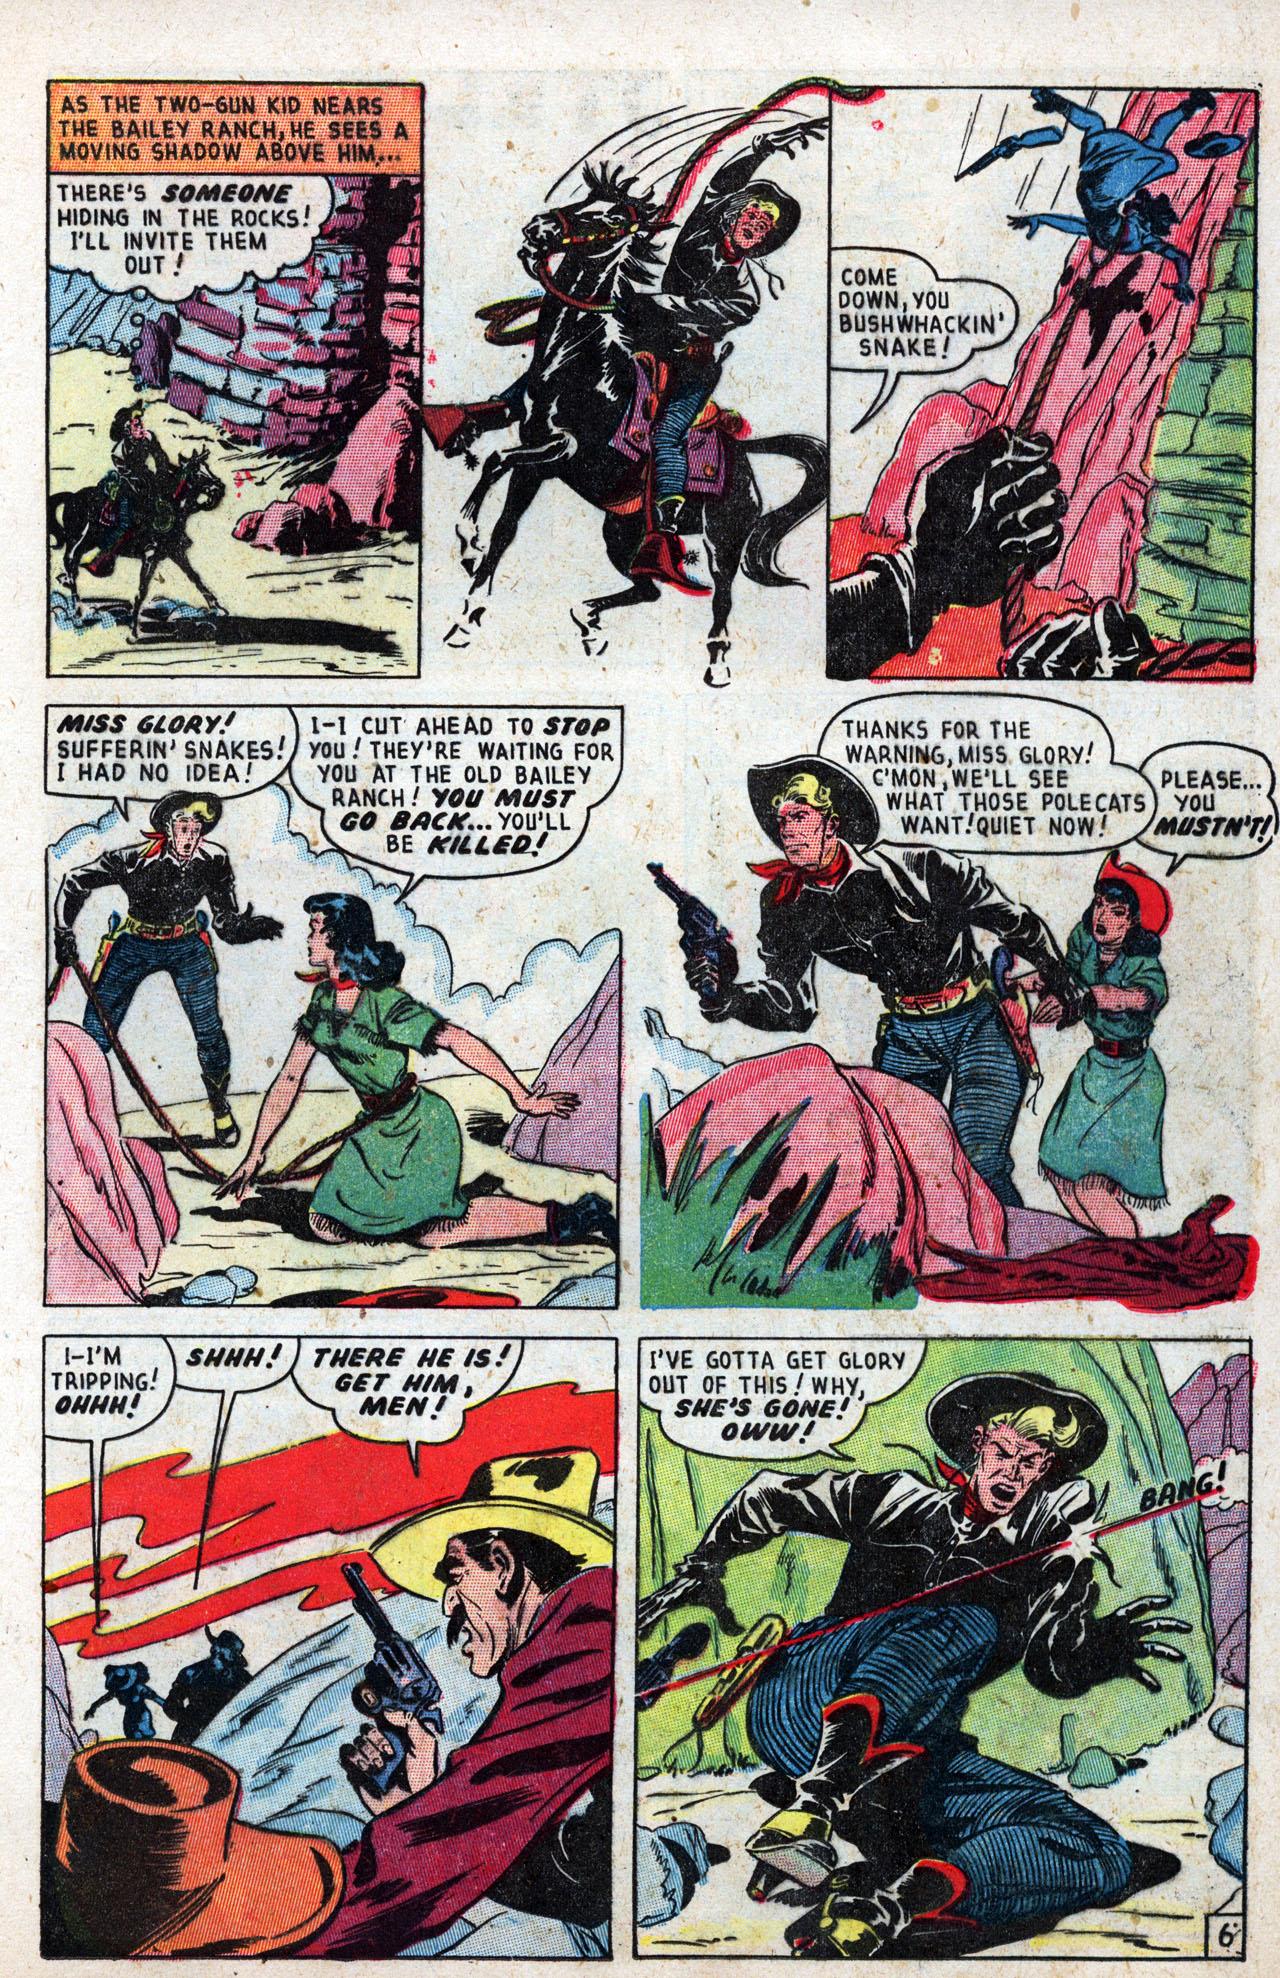 Read online Two-Gun Kid comic -  Issue #3 - 13